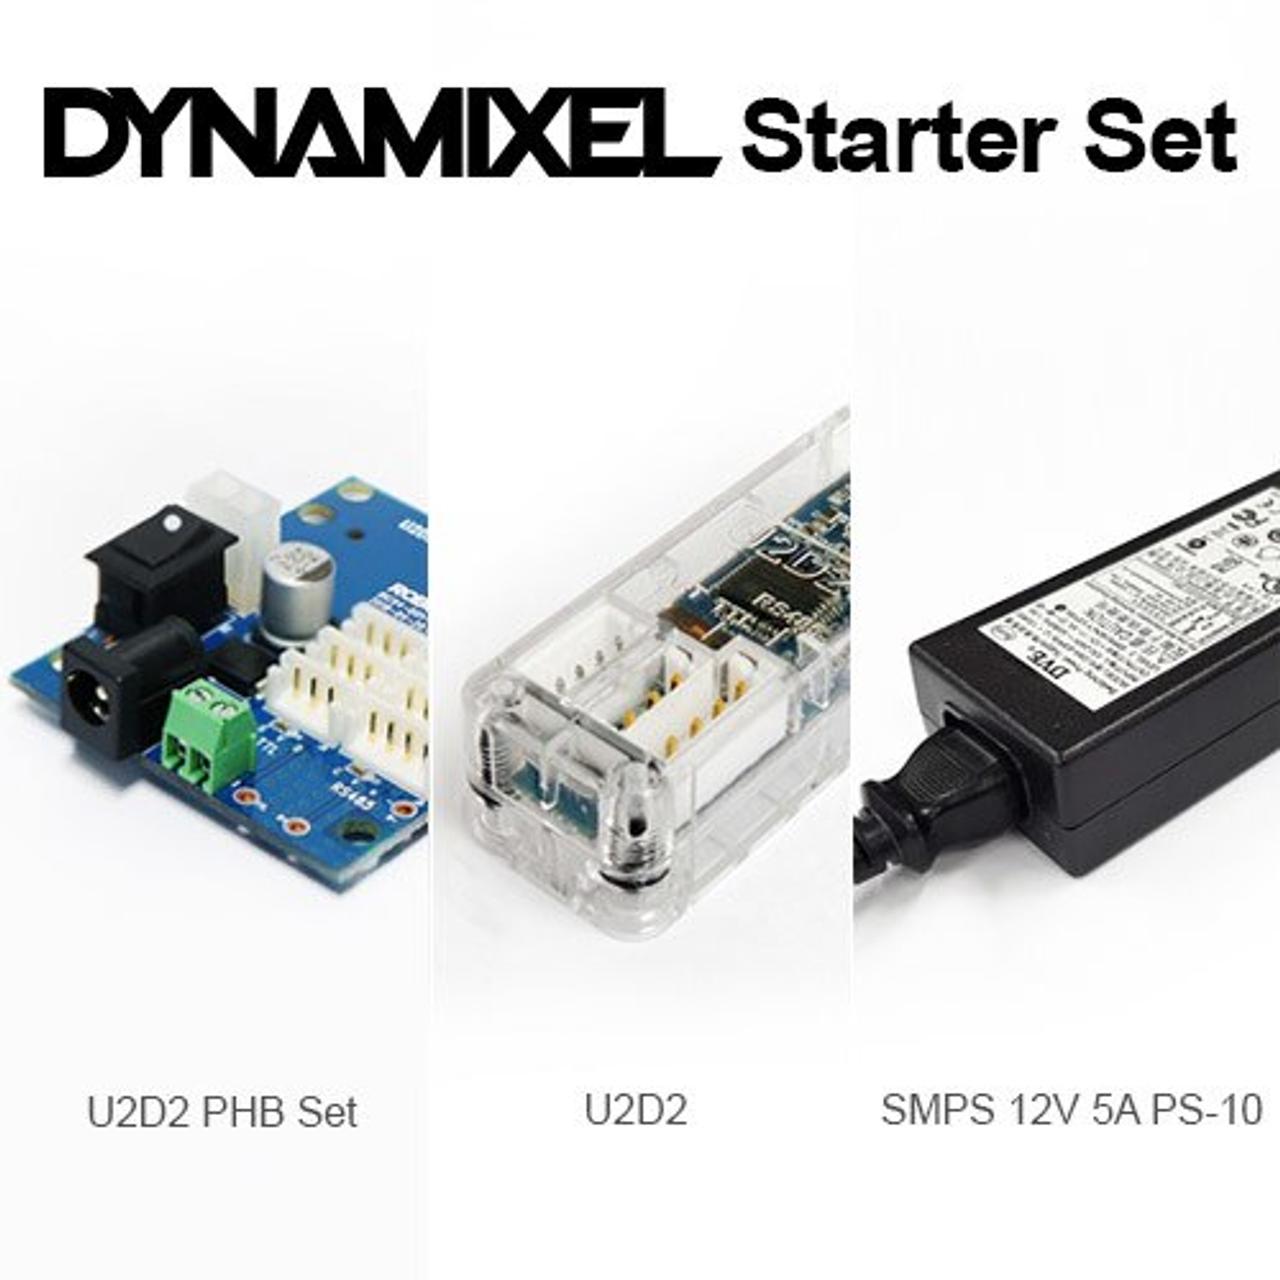 DYNAMIXEL Starter Set [US]